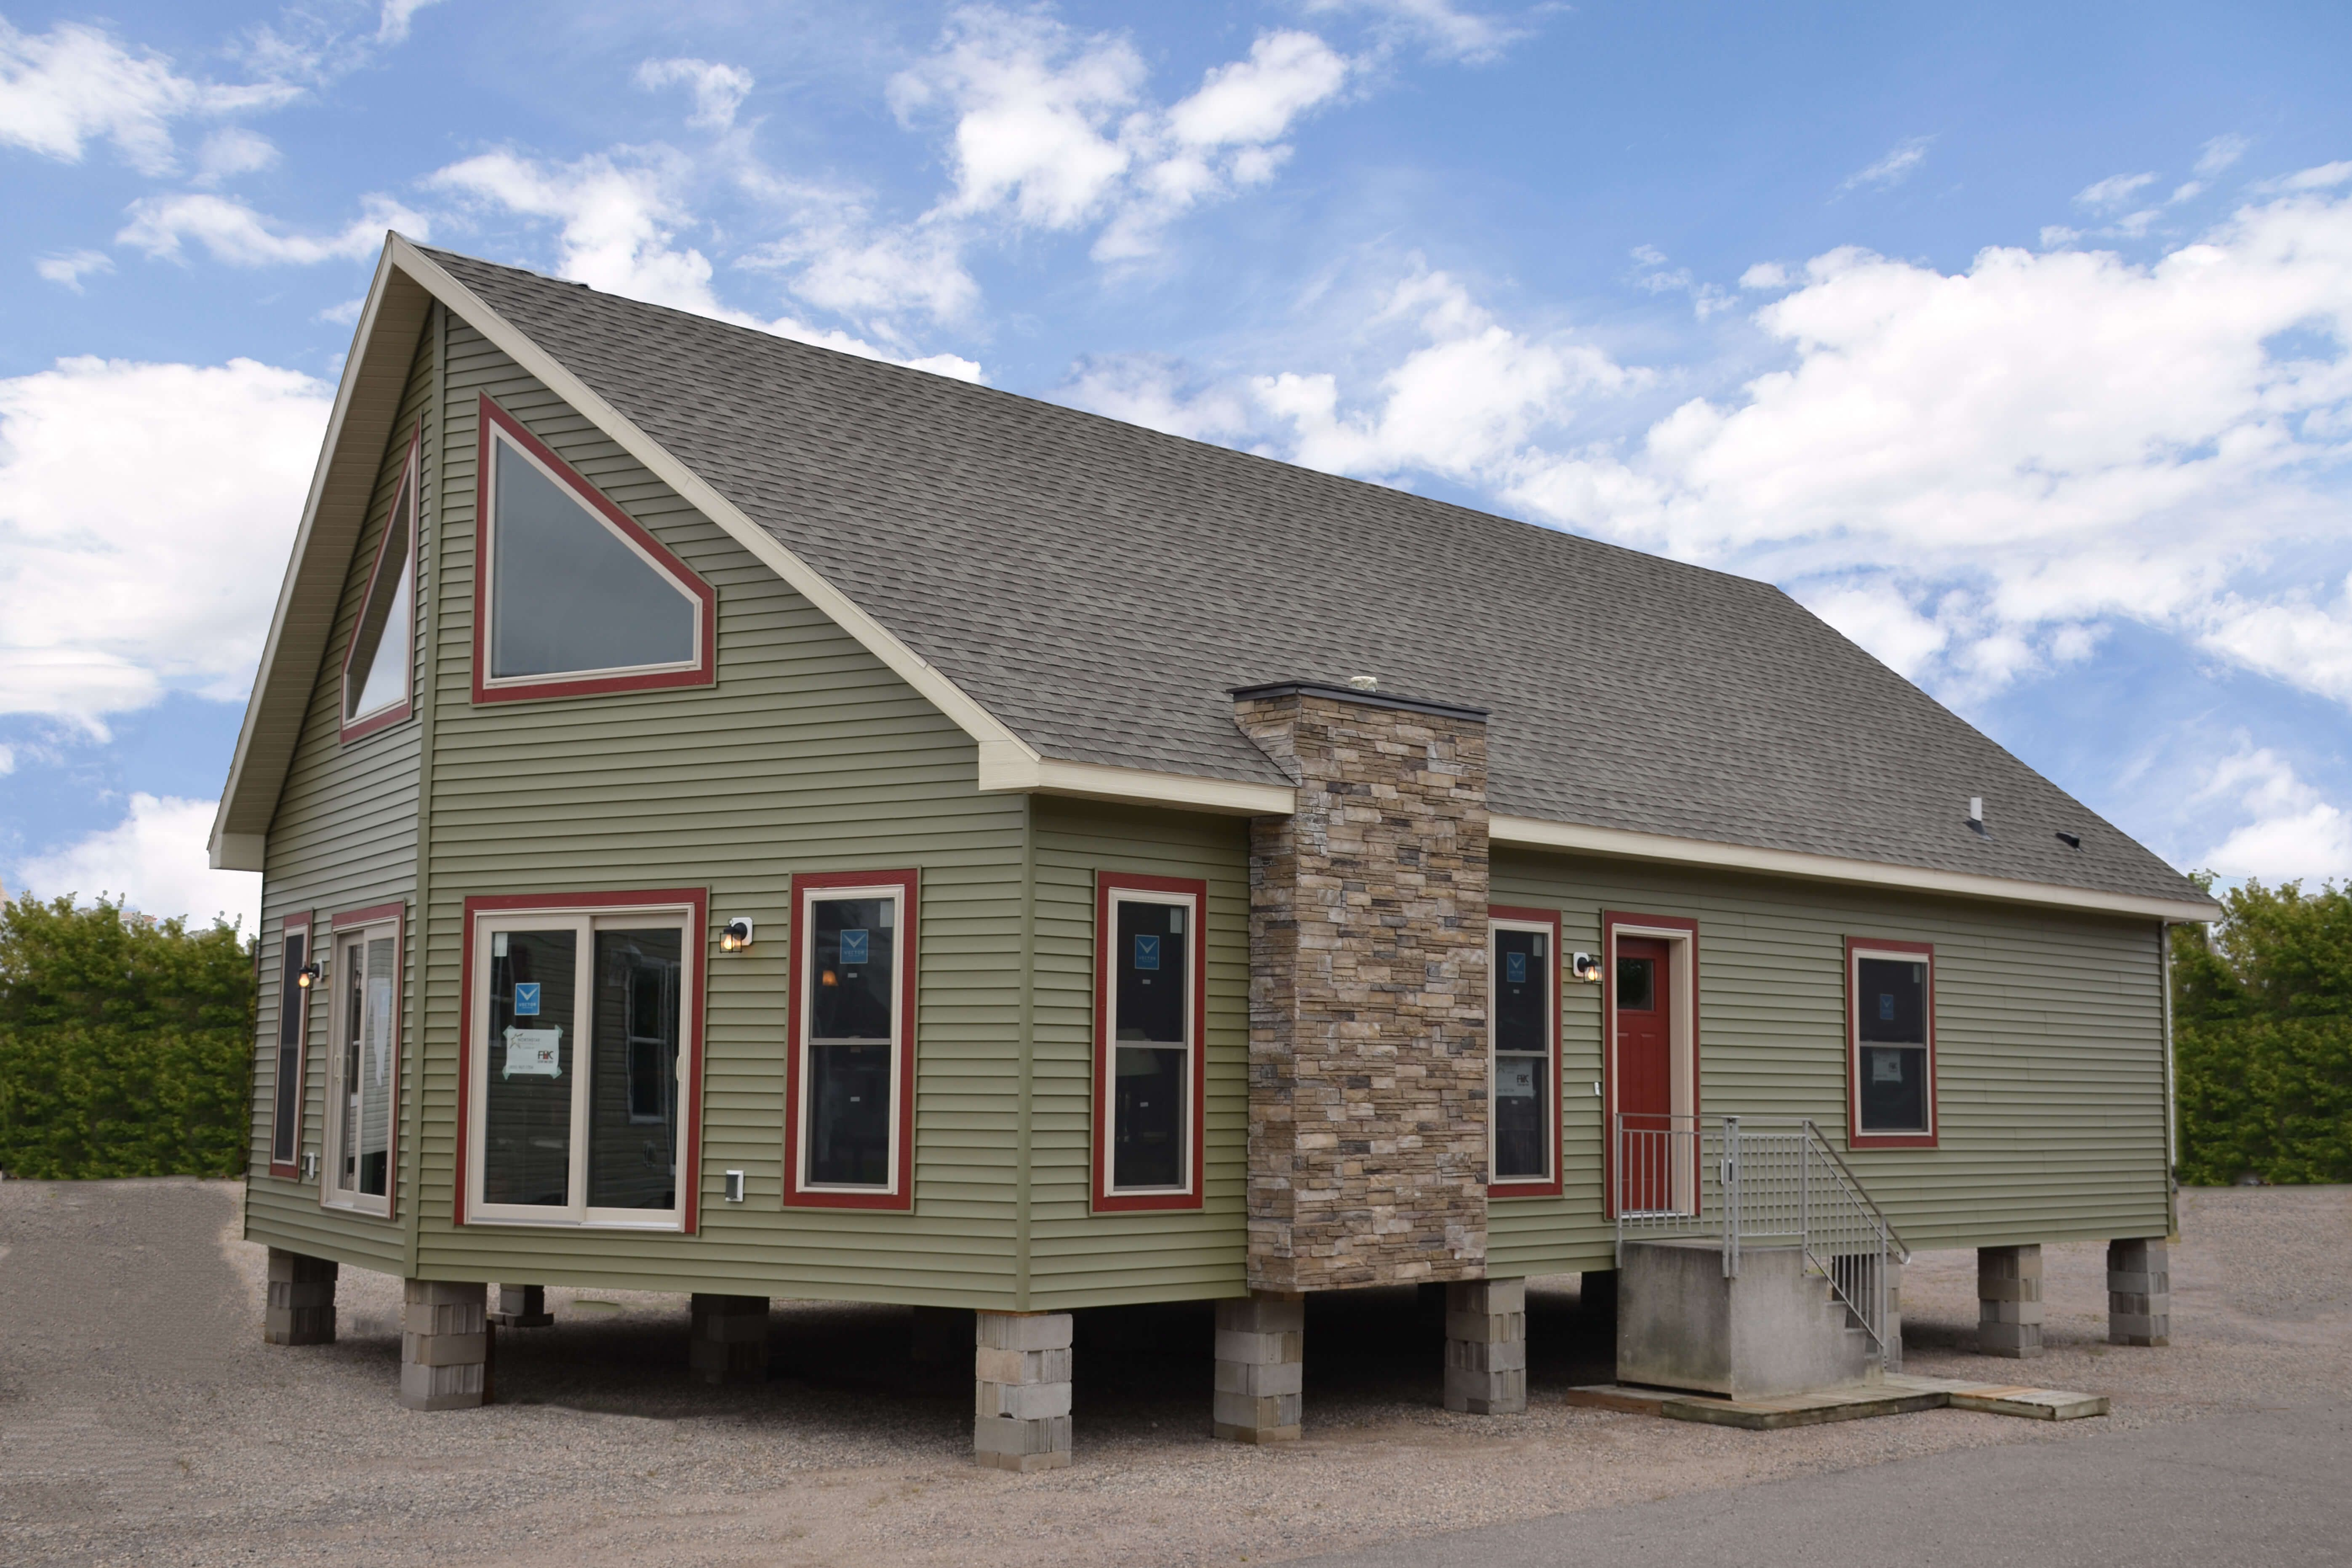 Vinyl Siding In Spruce Timberline Hd Shingles In Weathered Wood Plum Creek Versetta Stone Custom Modular Homes Modular Home Floor Plans Modular Homes